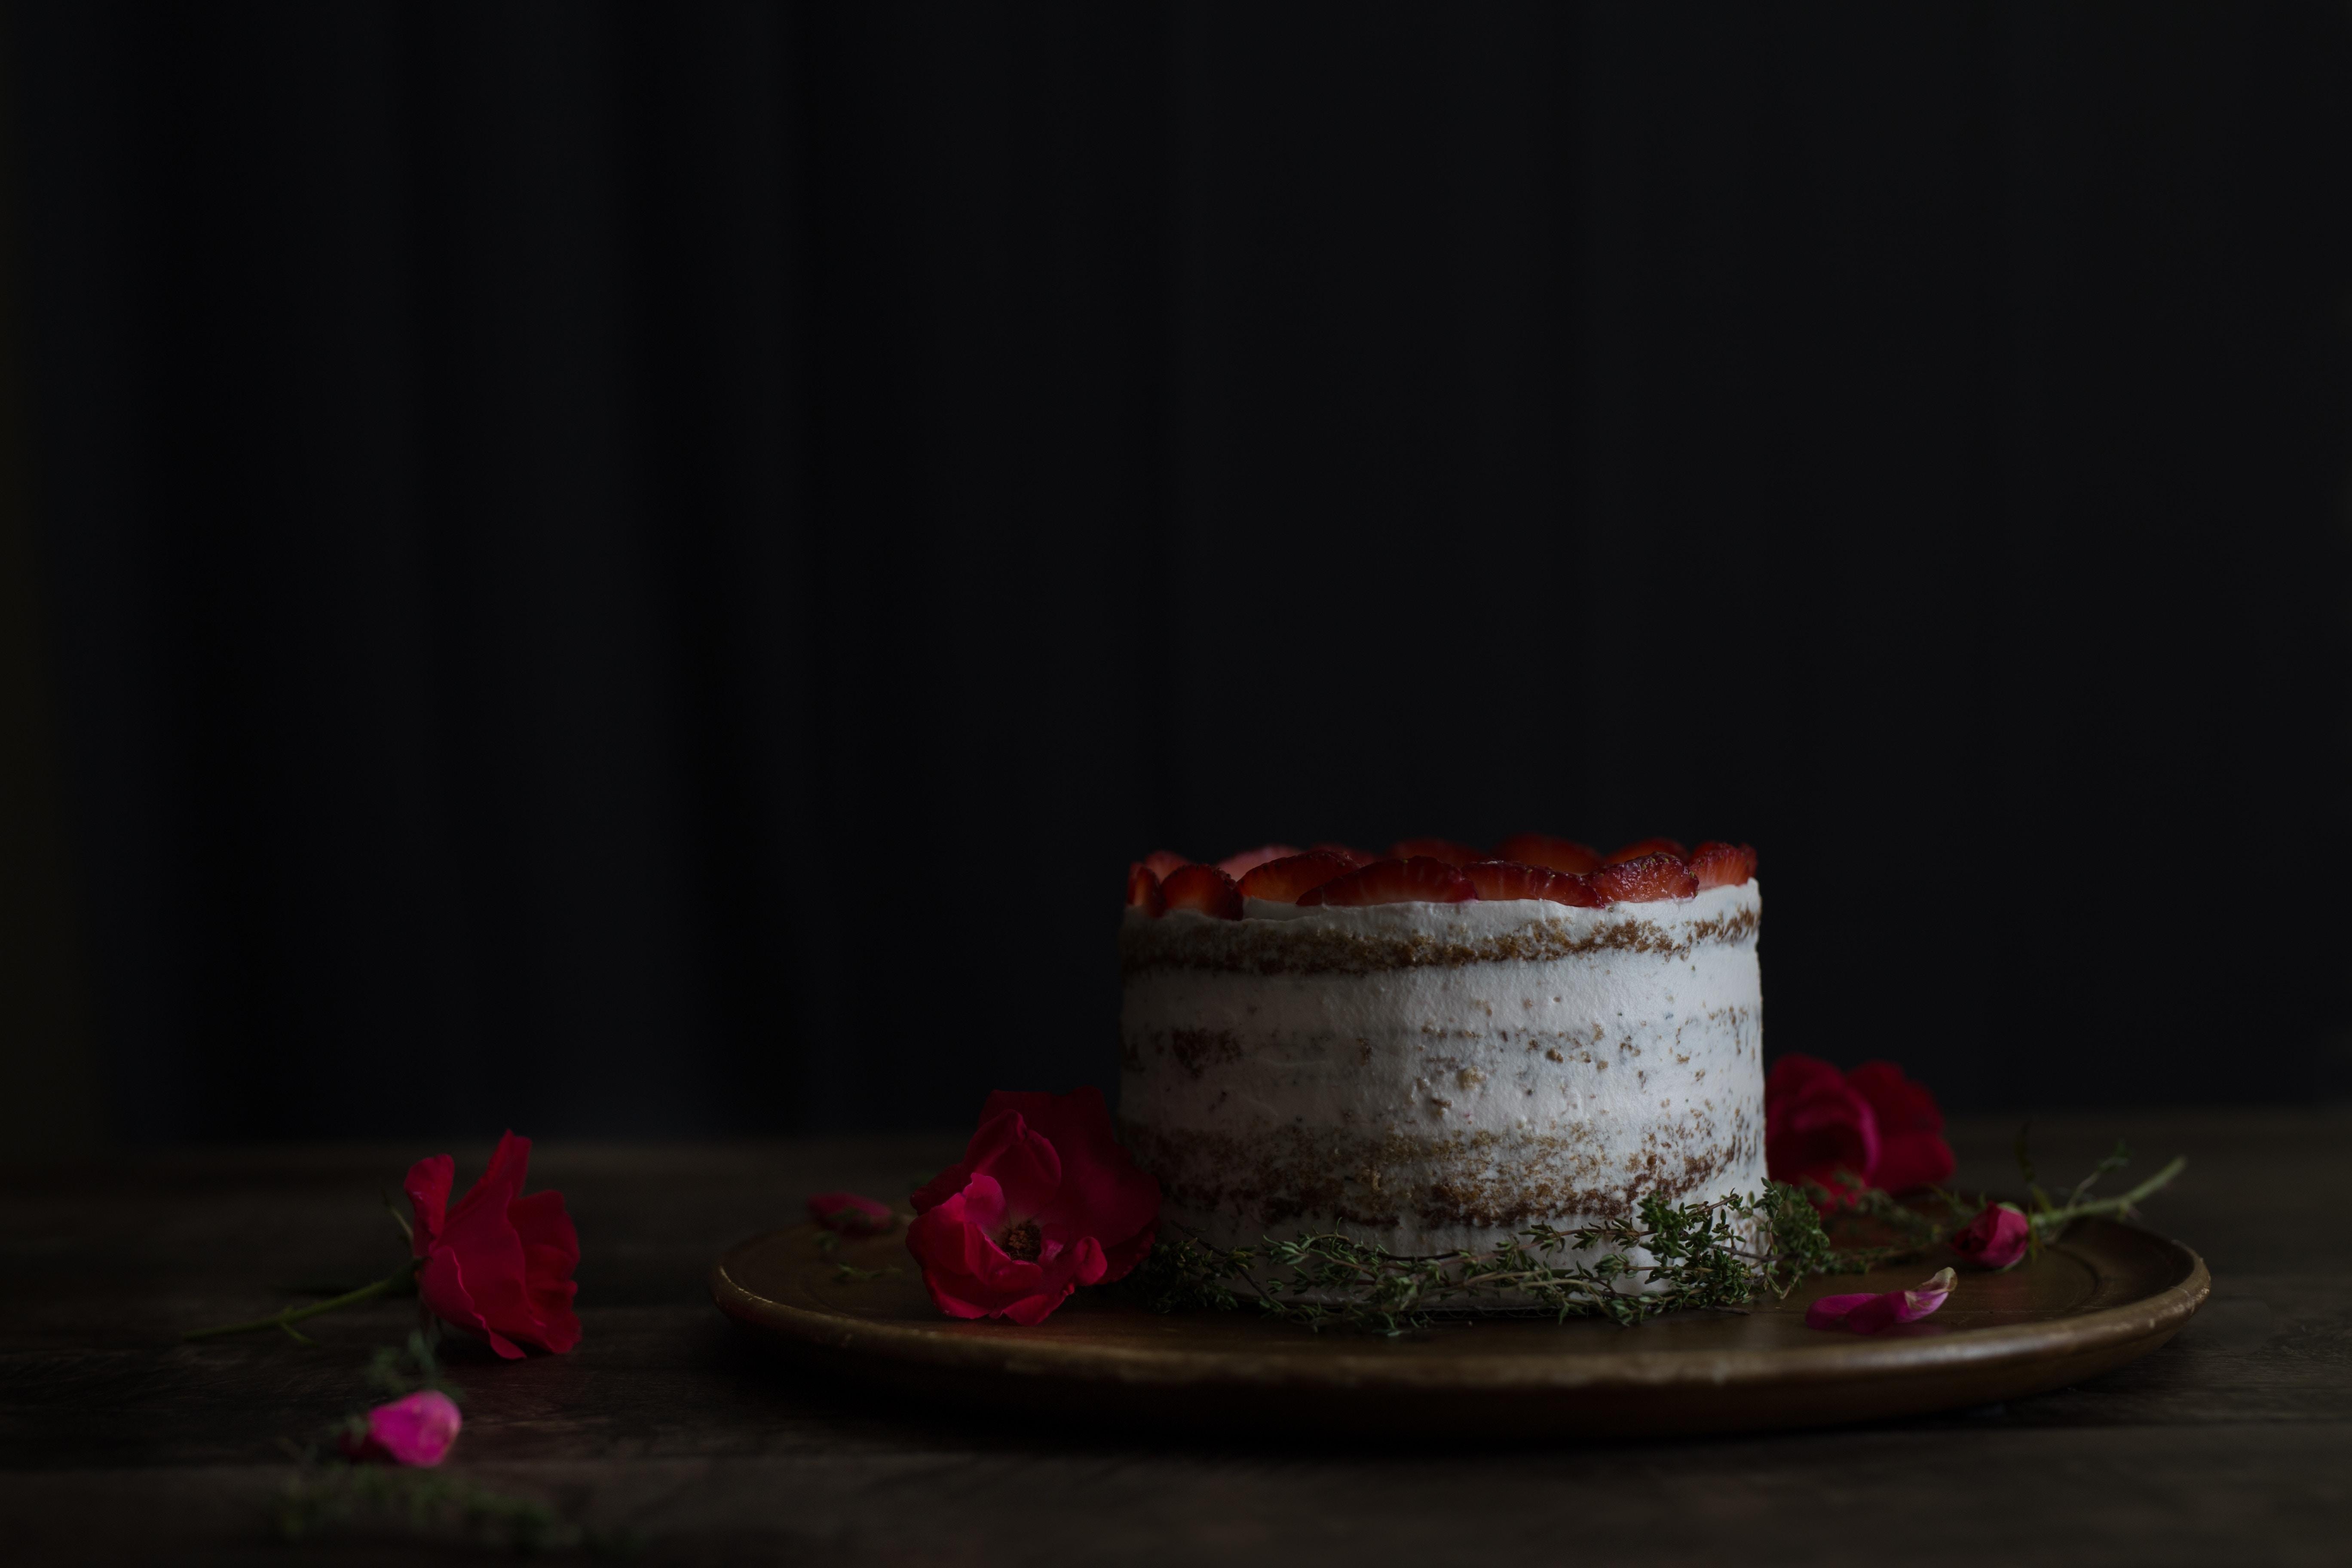 Free Images : darkness, baking, dessert, lighting, still